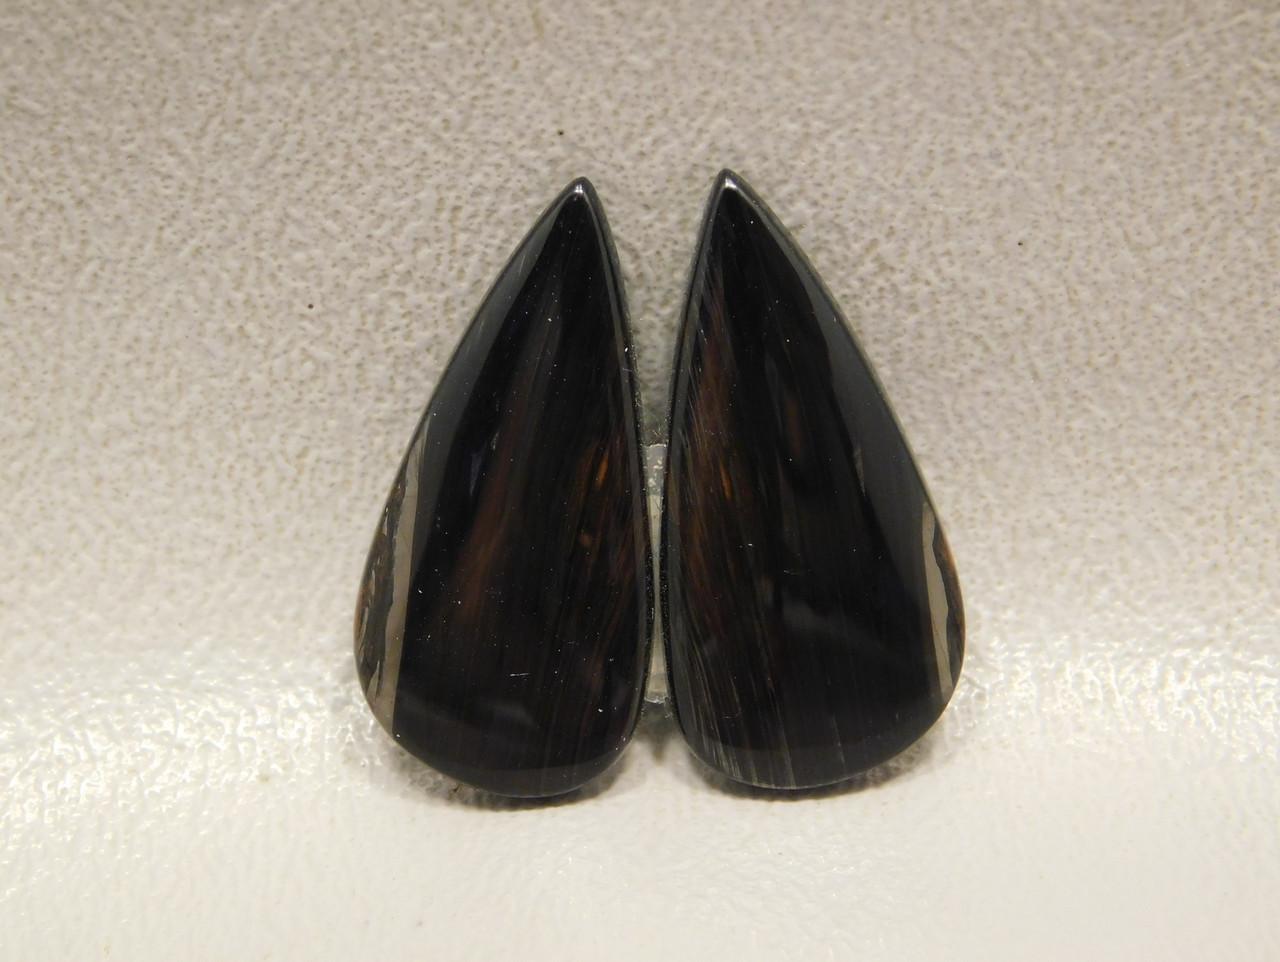 Mahogany Obsidian Gold Sheen Matched Pairs Cabochons Stones #15